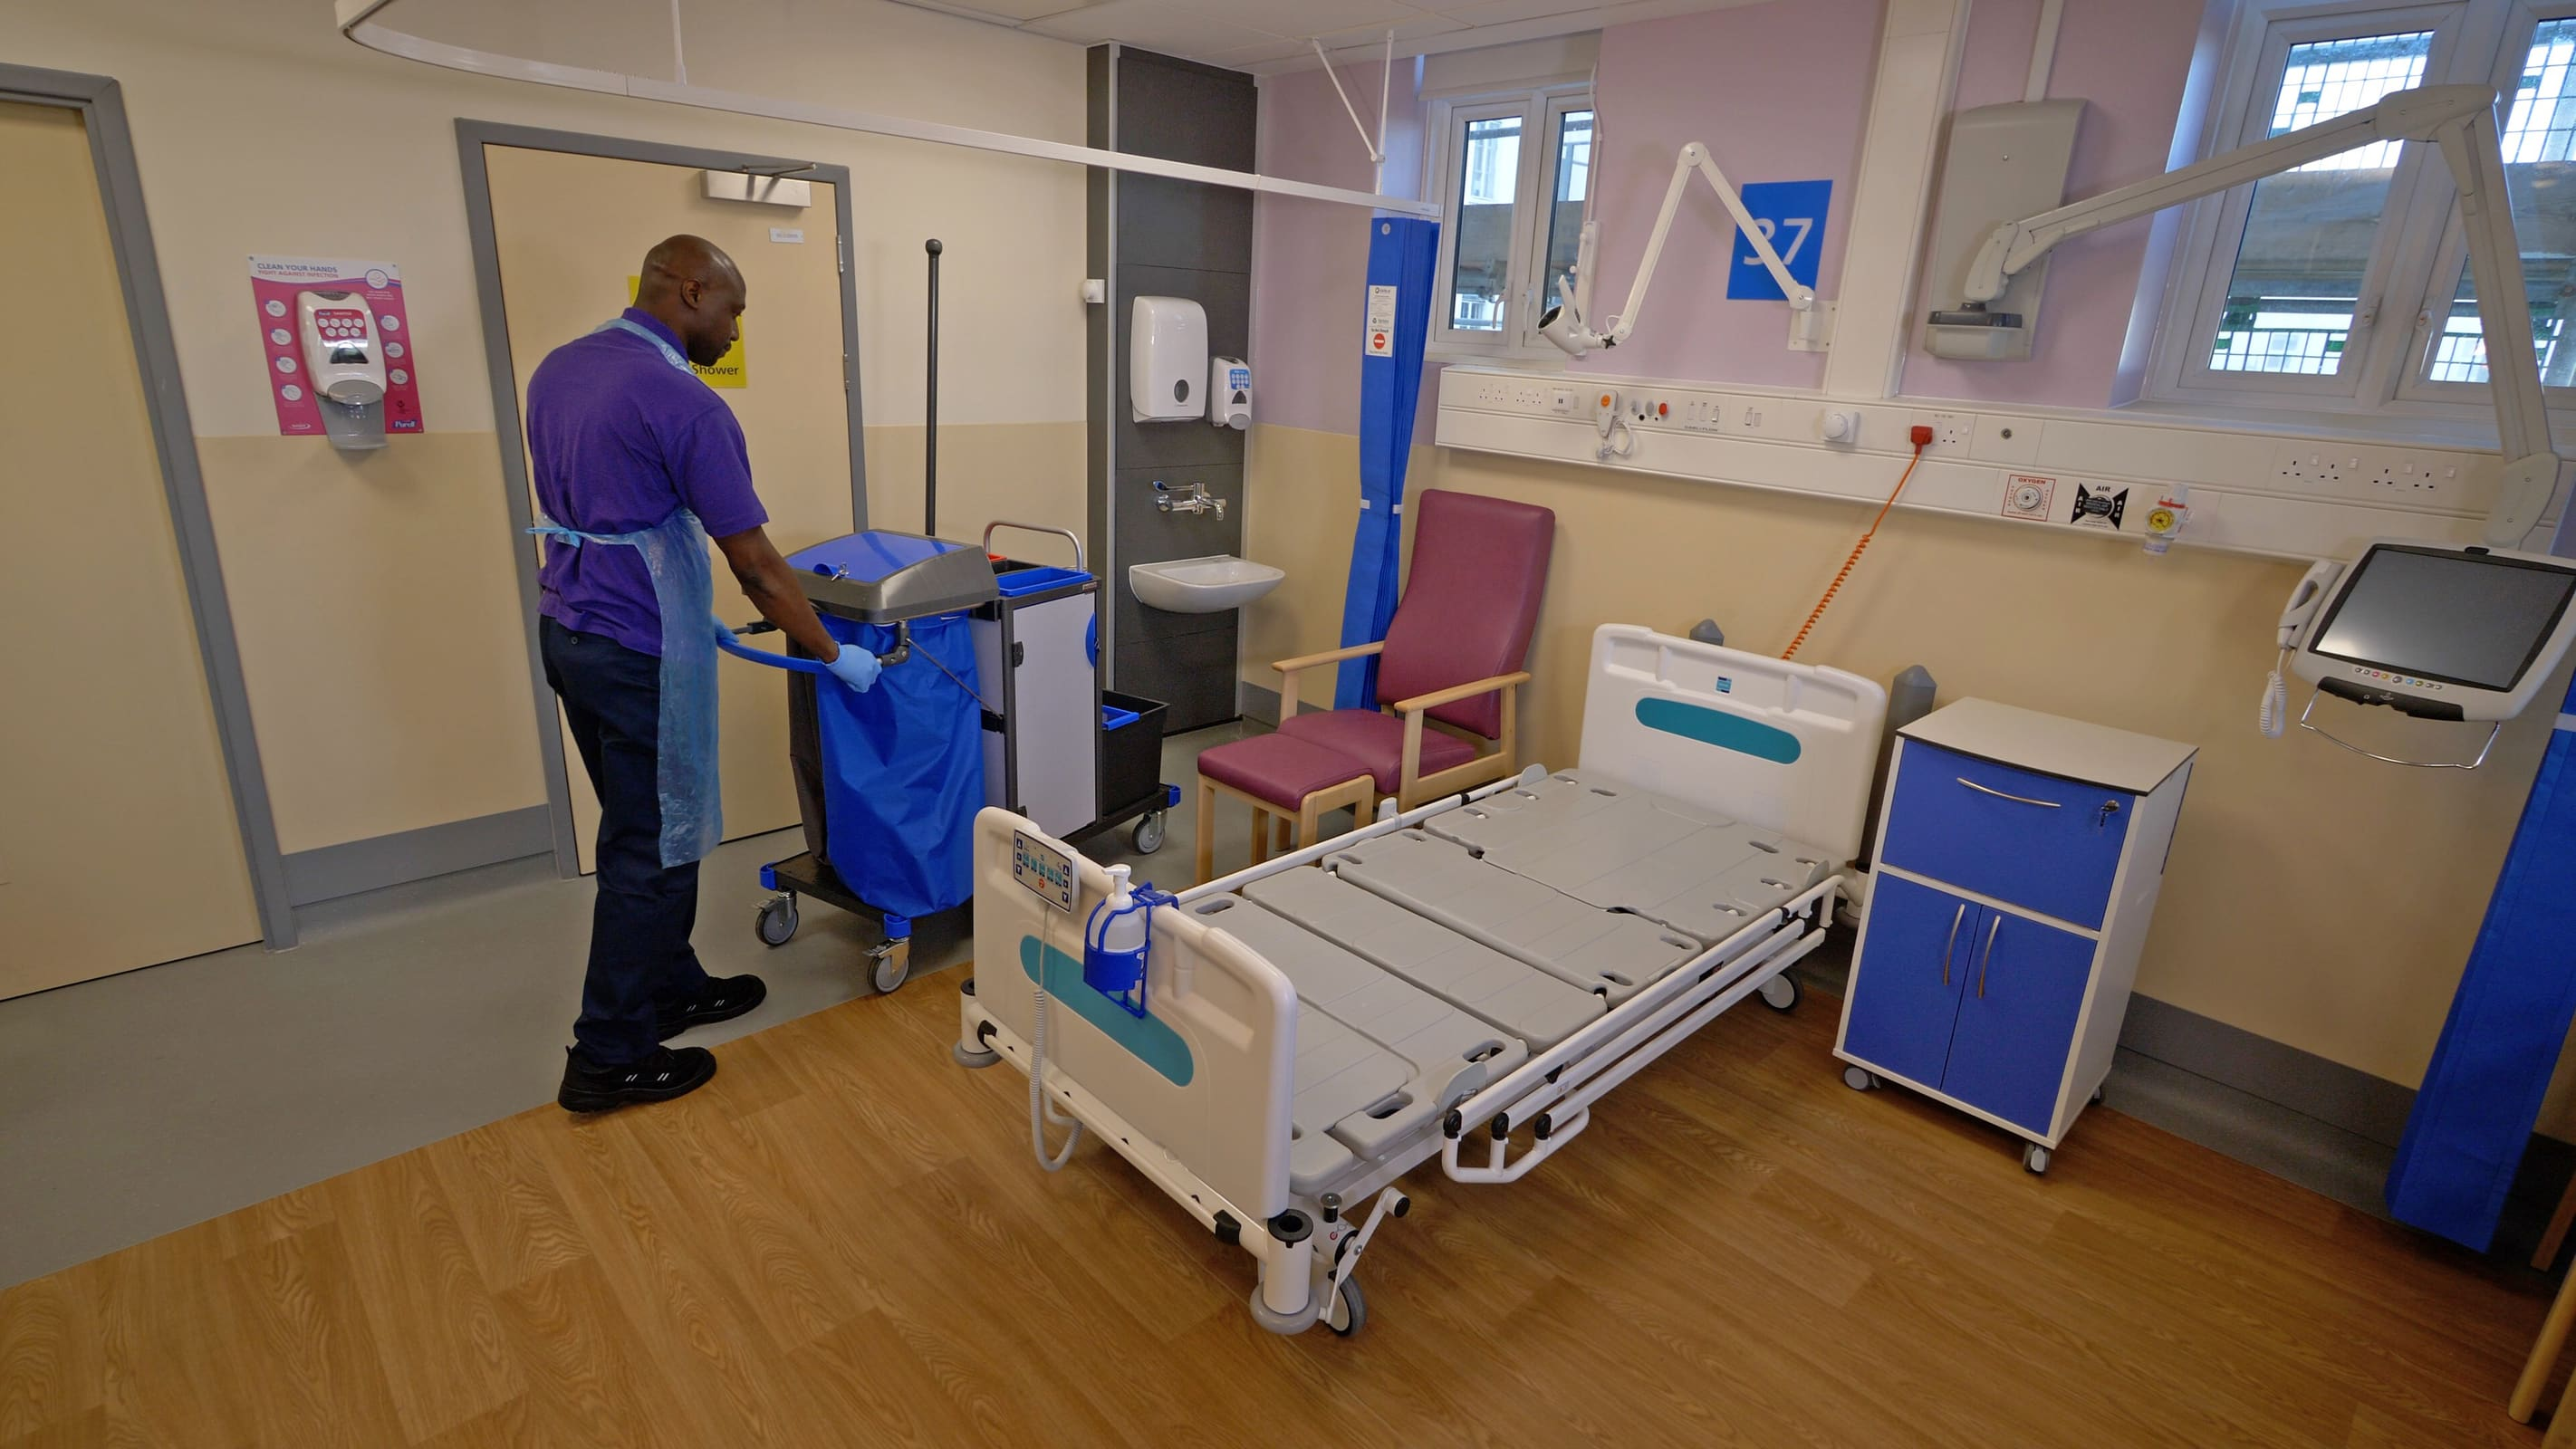 NHS Training Material